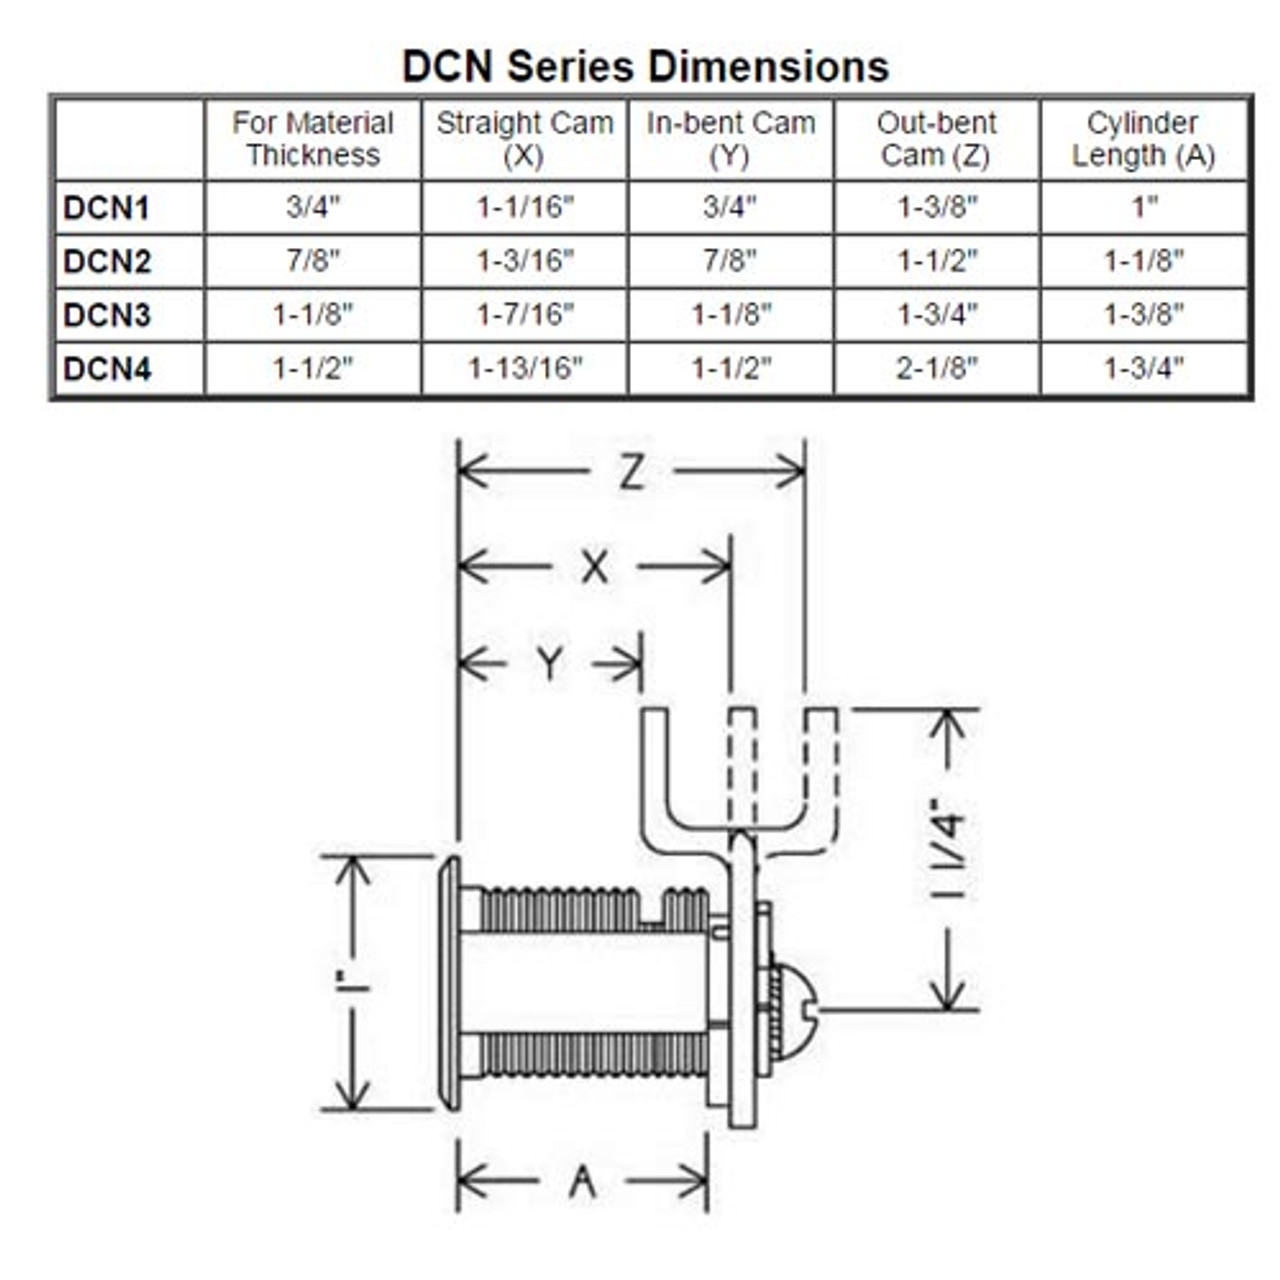 Olympus DCN3-KA103-26D N Series Keyed Alike Reversible Cam Lock in Satin Chrome